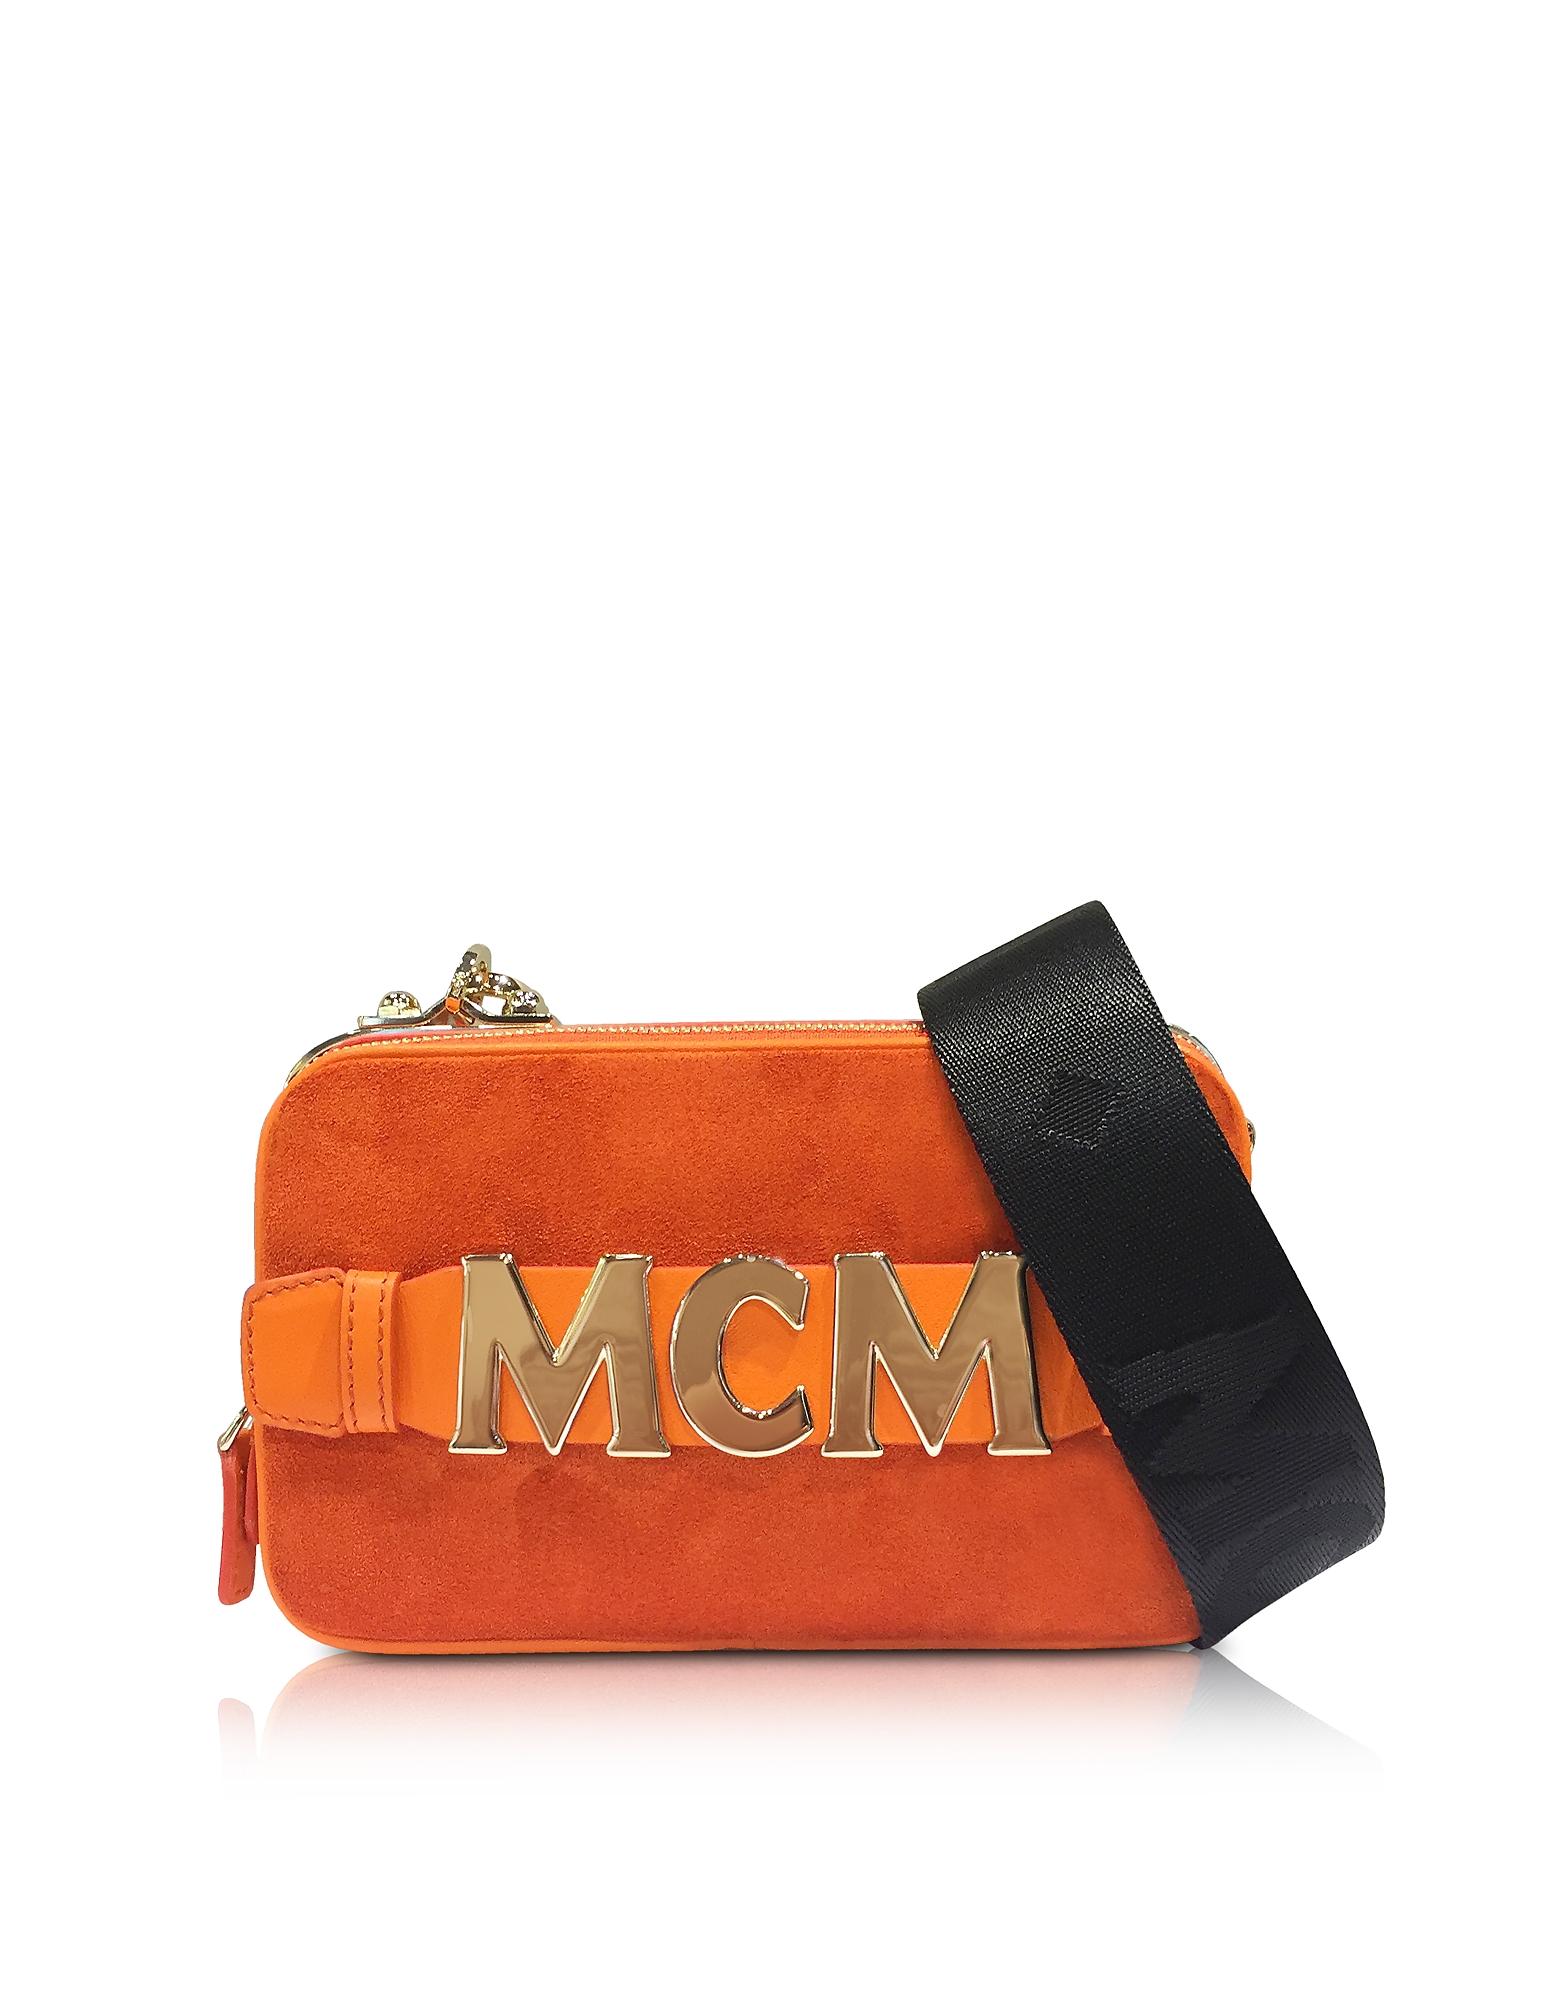 MCM Handbags, Suede Cubism Mini Crossbody Bag